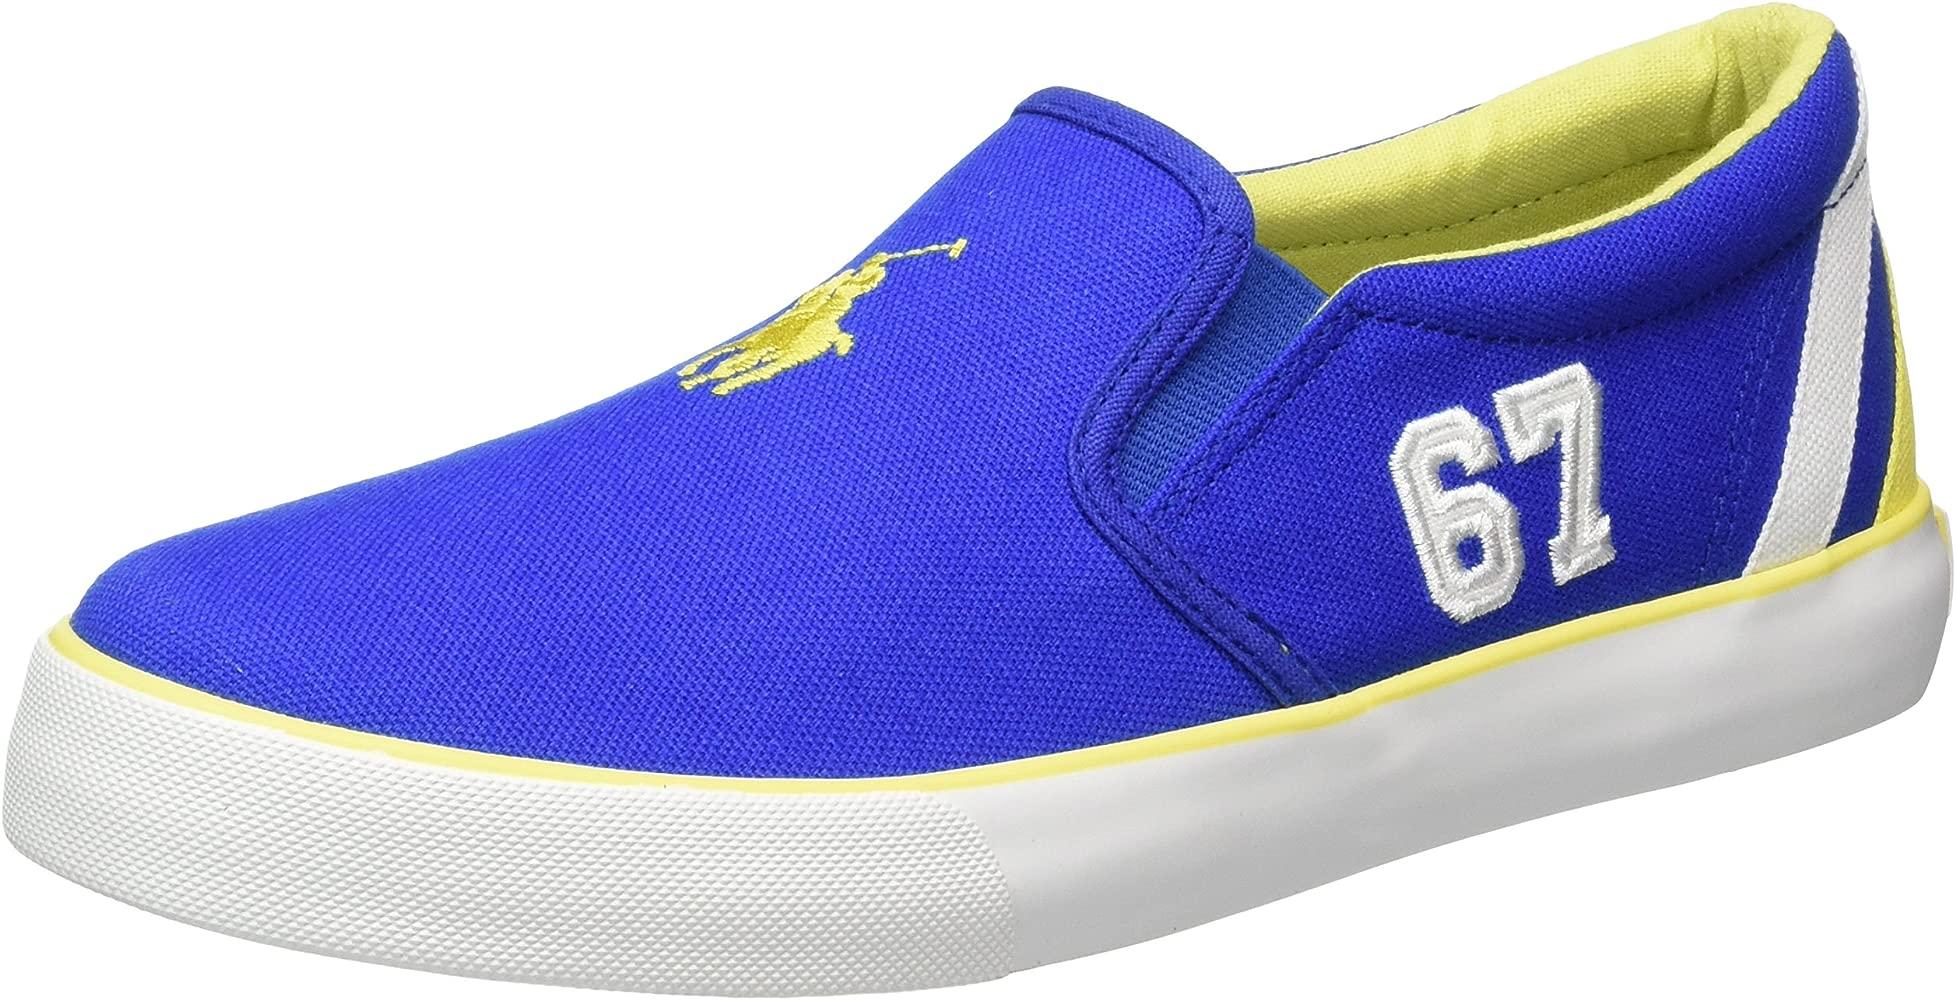 Polo Ralph LaurenVincent - Zapatillas Niños-Niñas, Color Azul ...